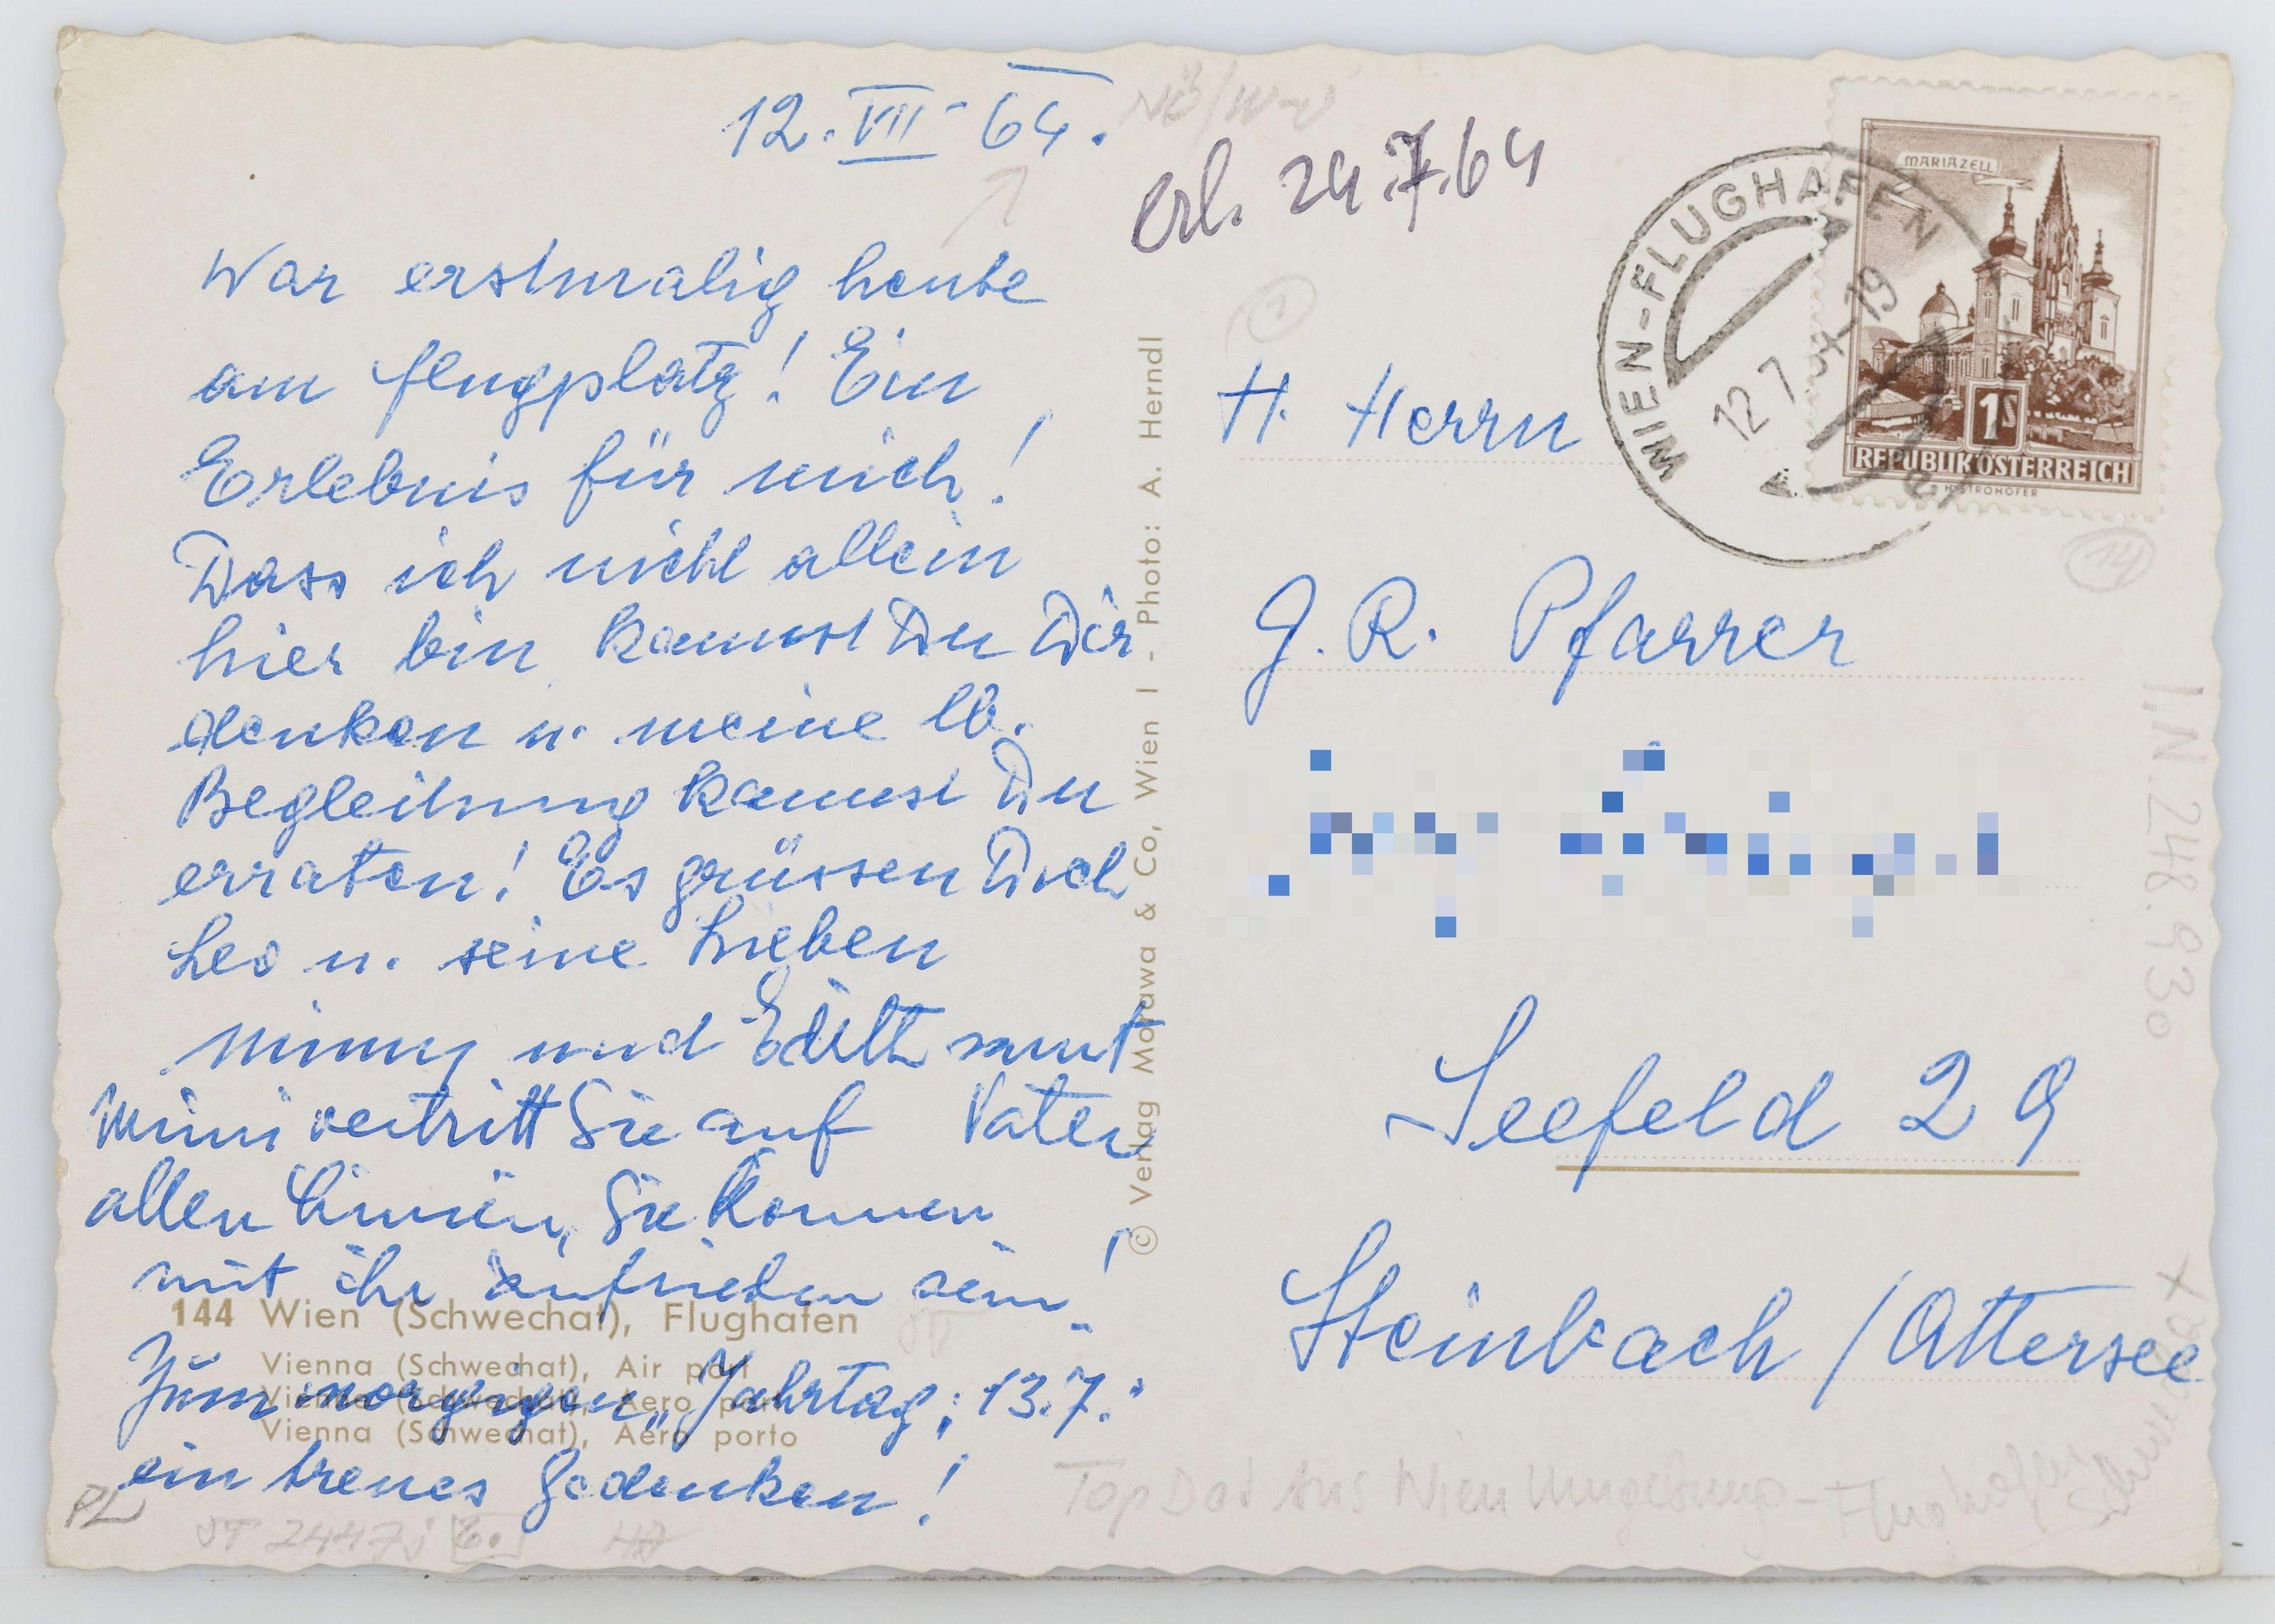 Музей търси доброволци за разчитане на картичка